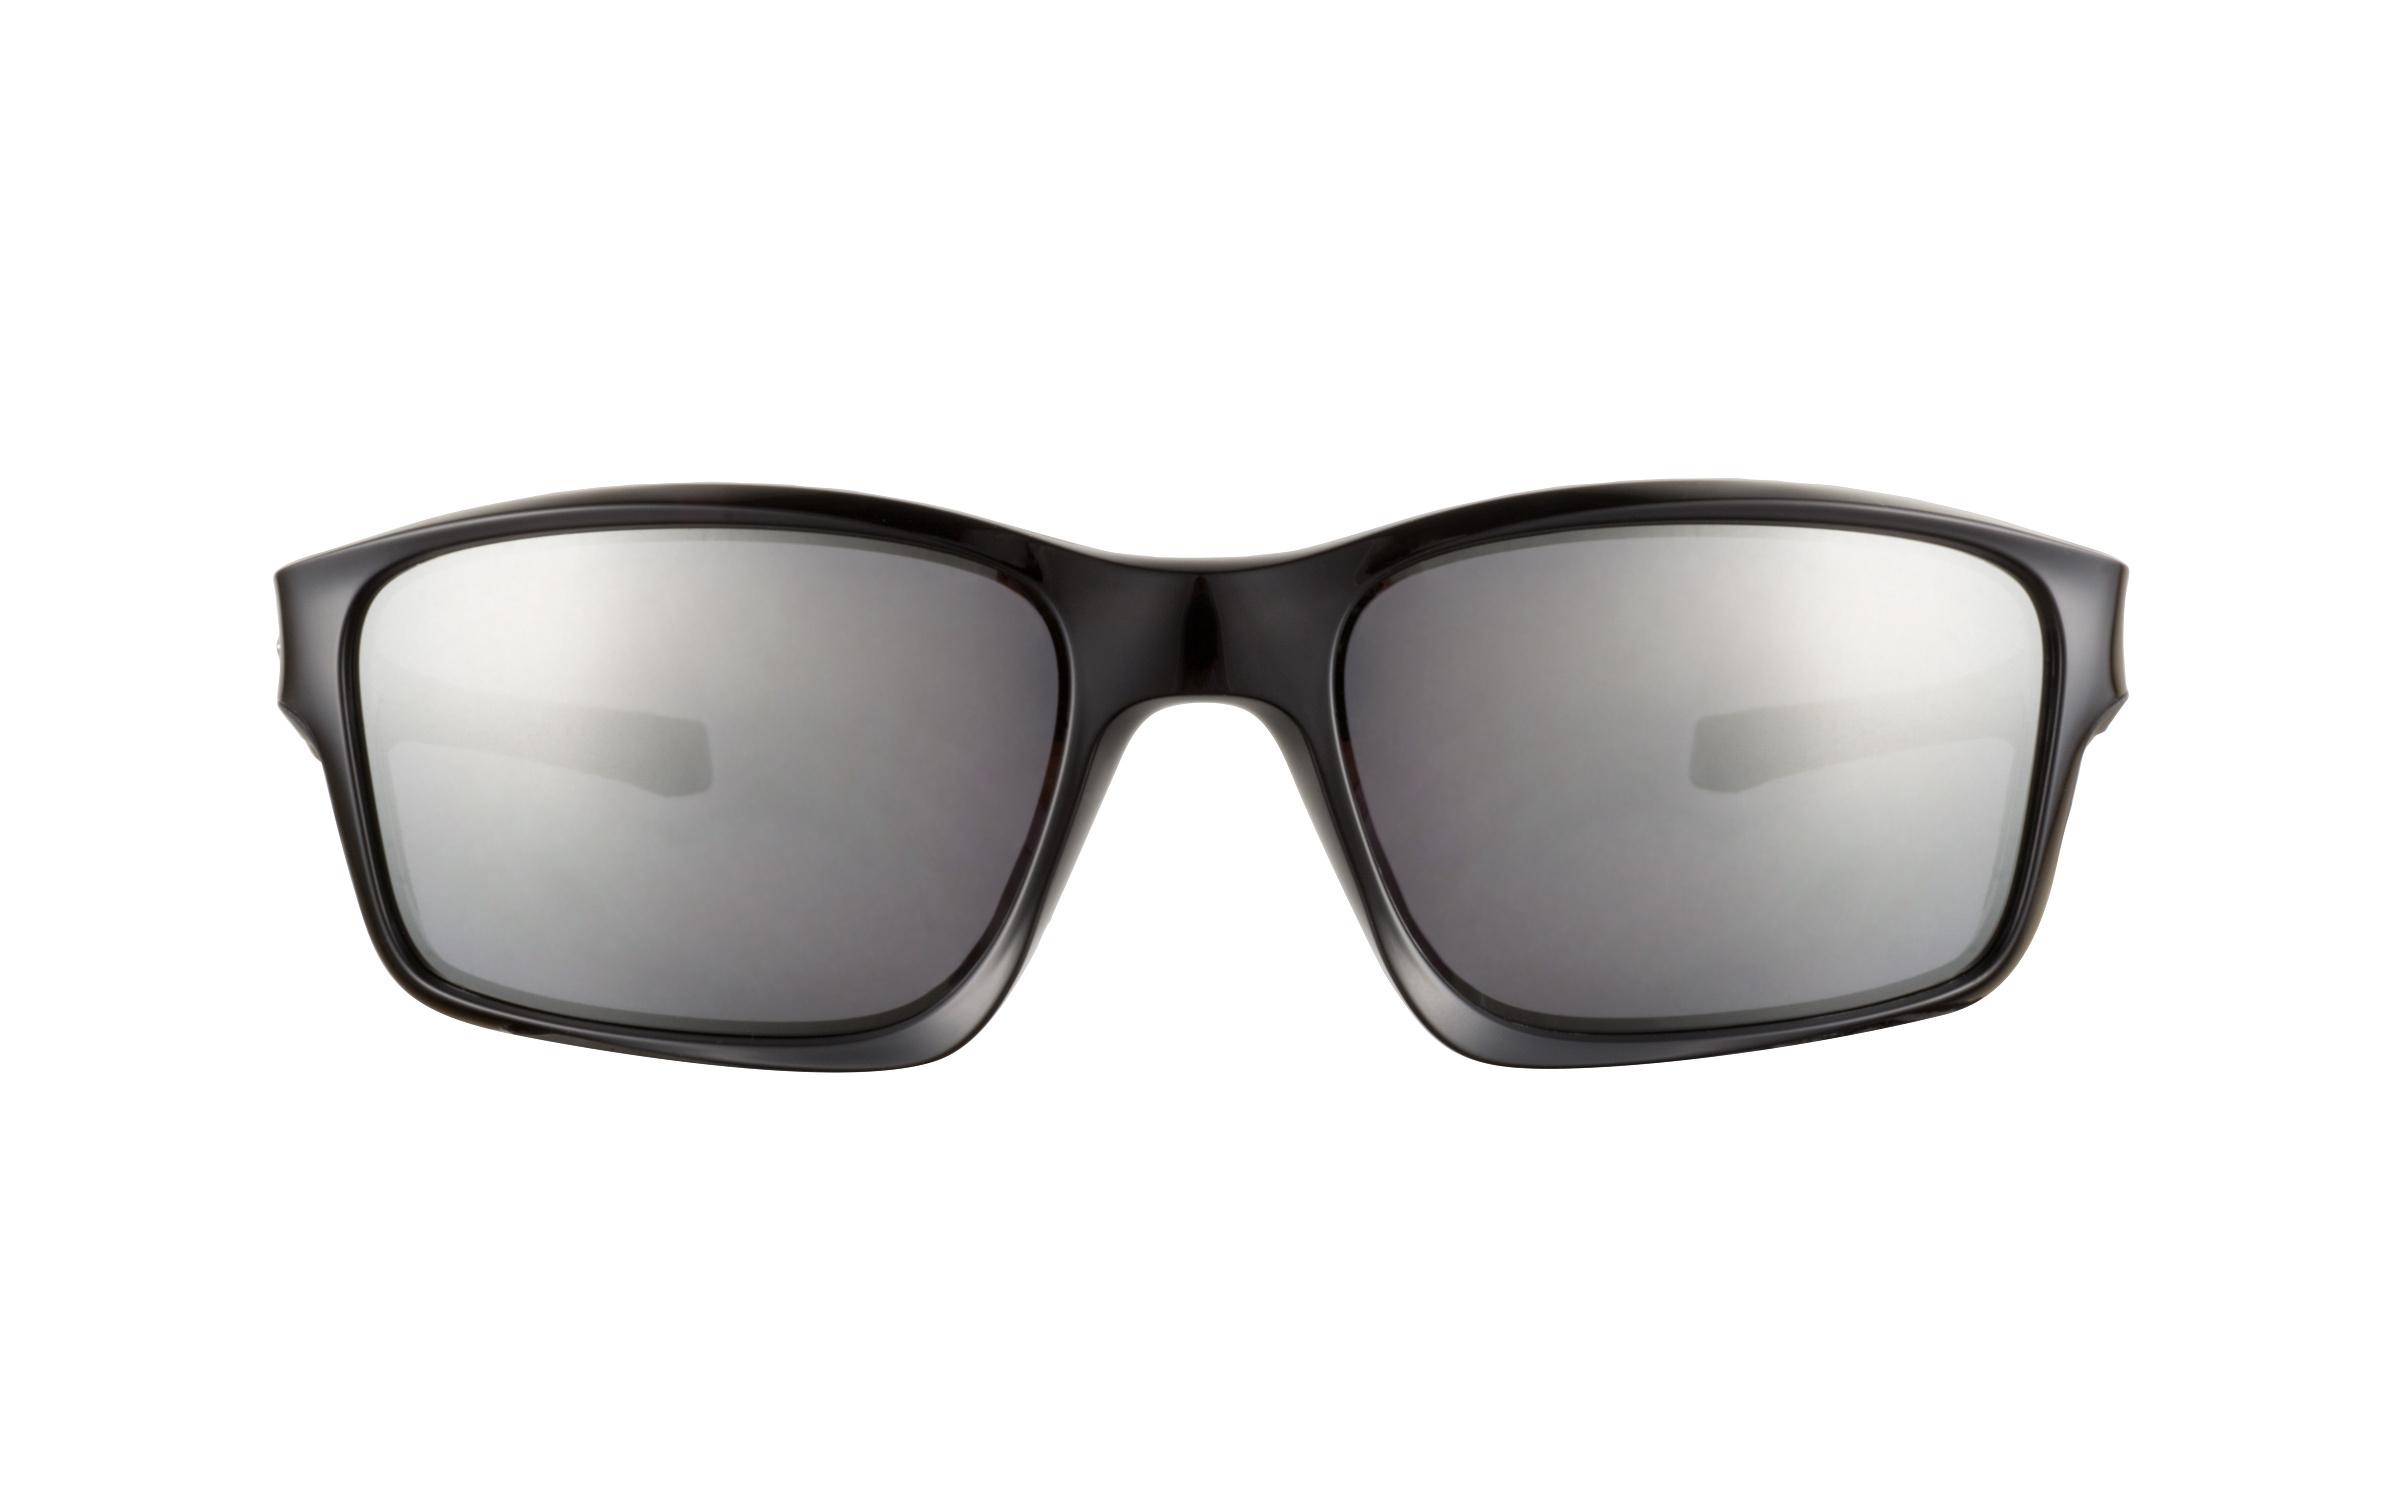 Oakley Chainlink 9247 01 Polished Black Sunglasses